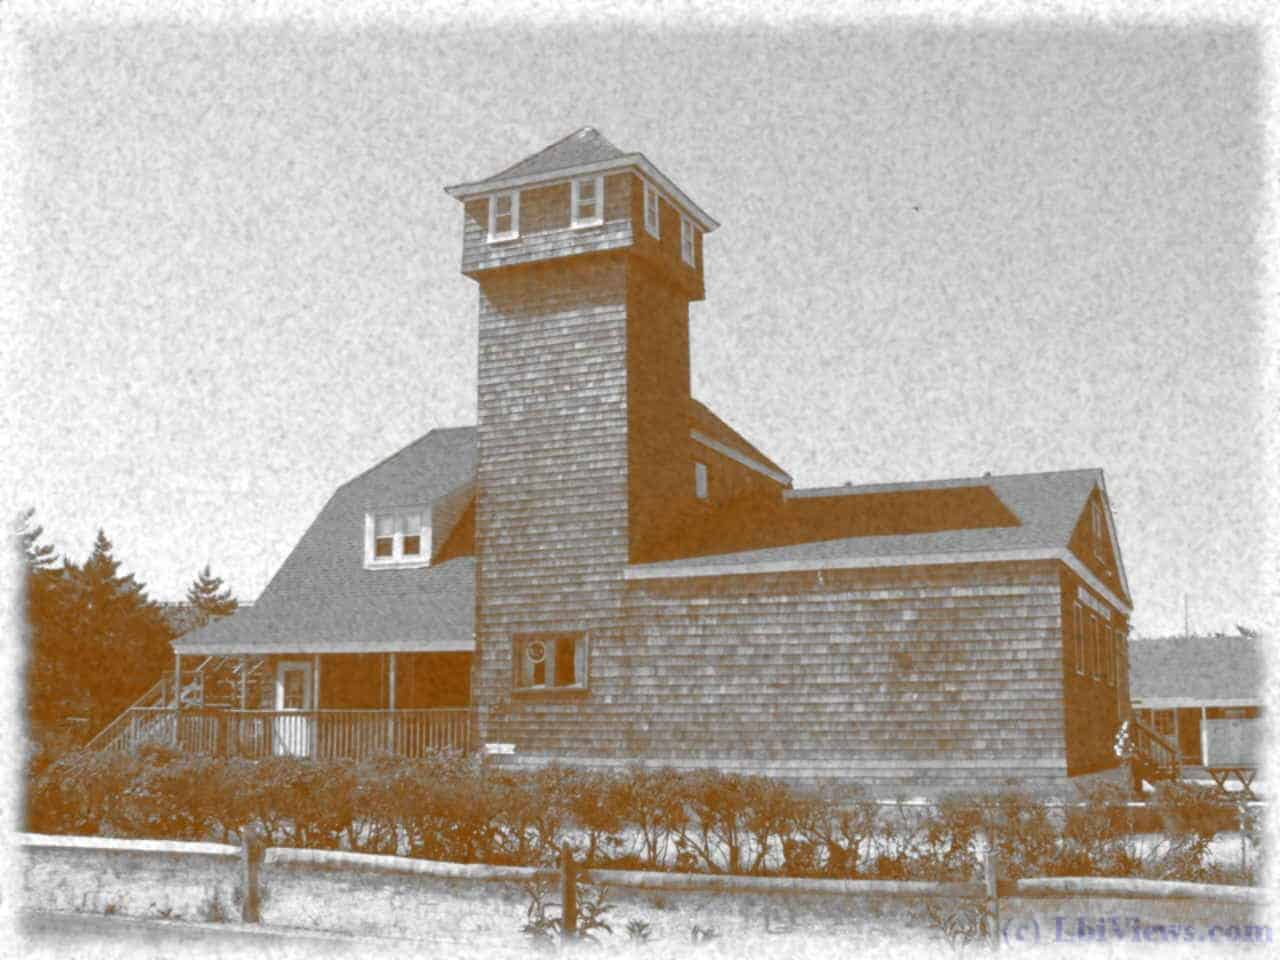 Harvey Cedars Lifesaving Station, Now the Long Beach Island Fishing Club